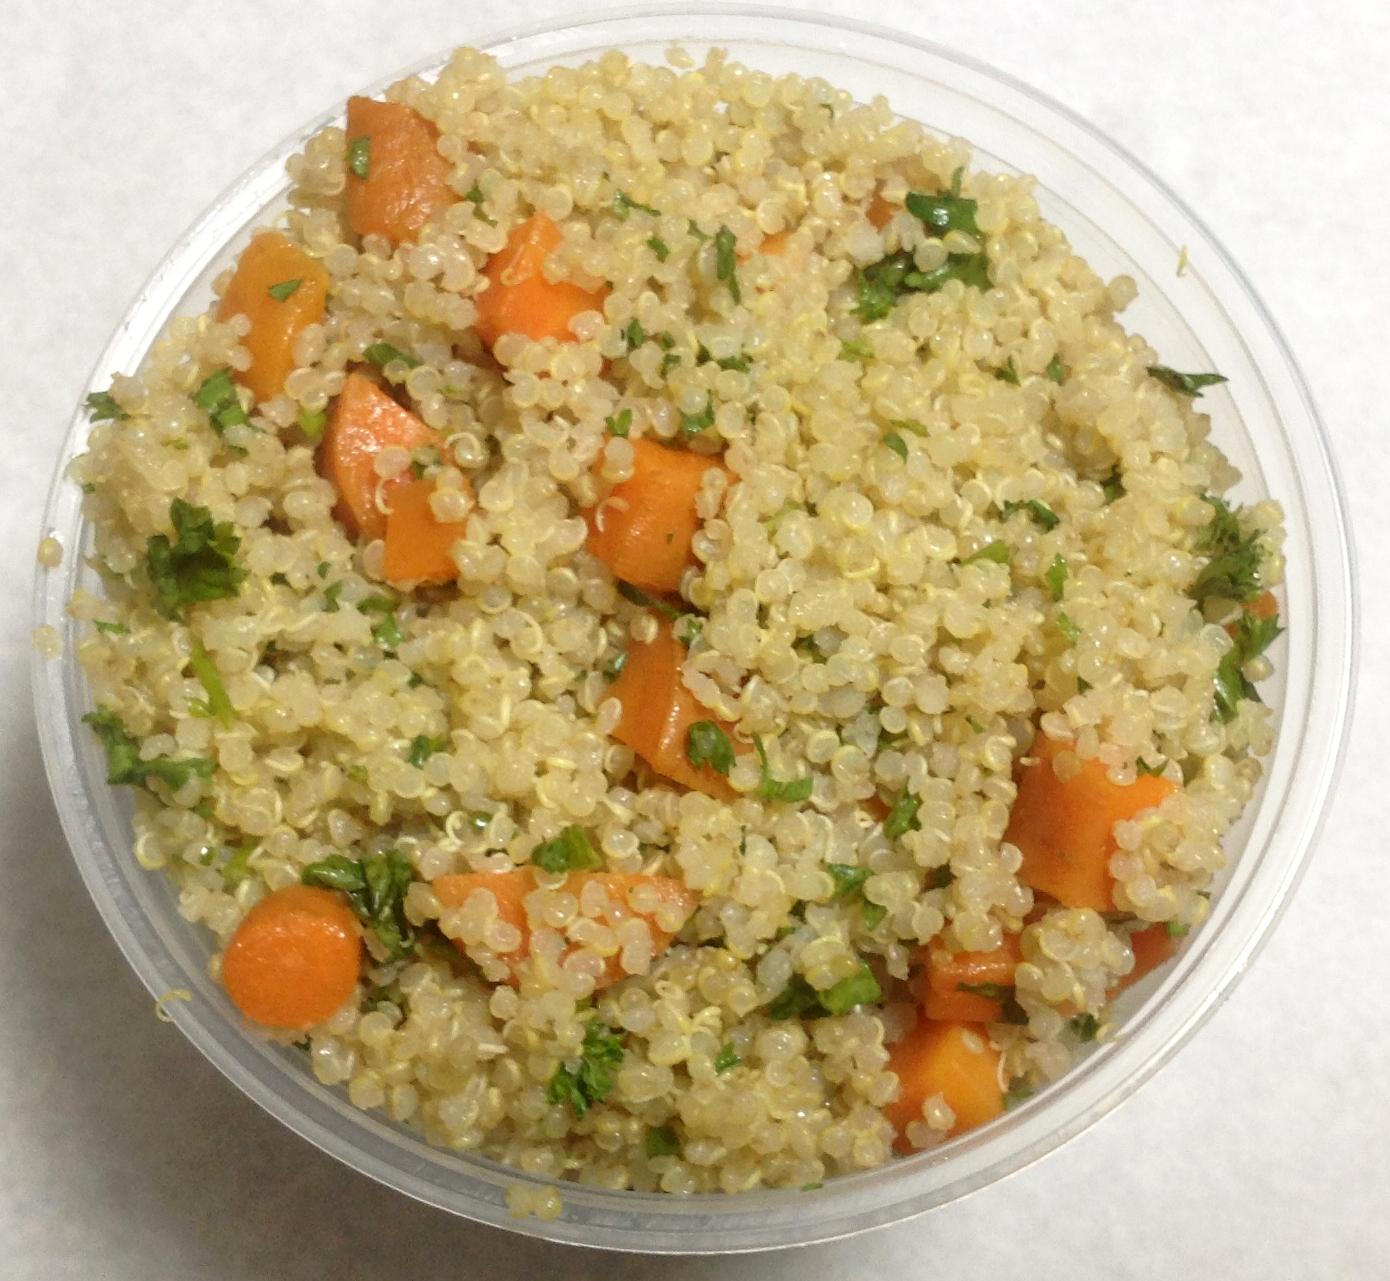 Quinoa, carrots and parsley.